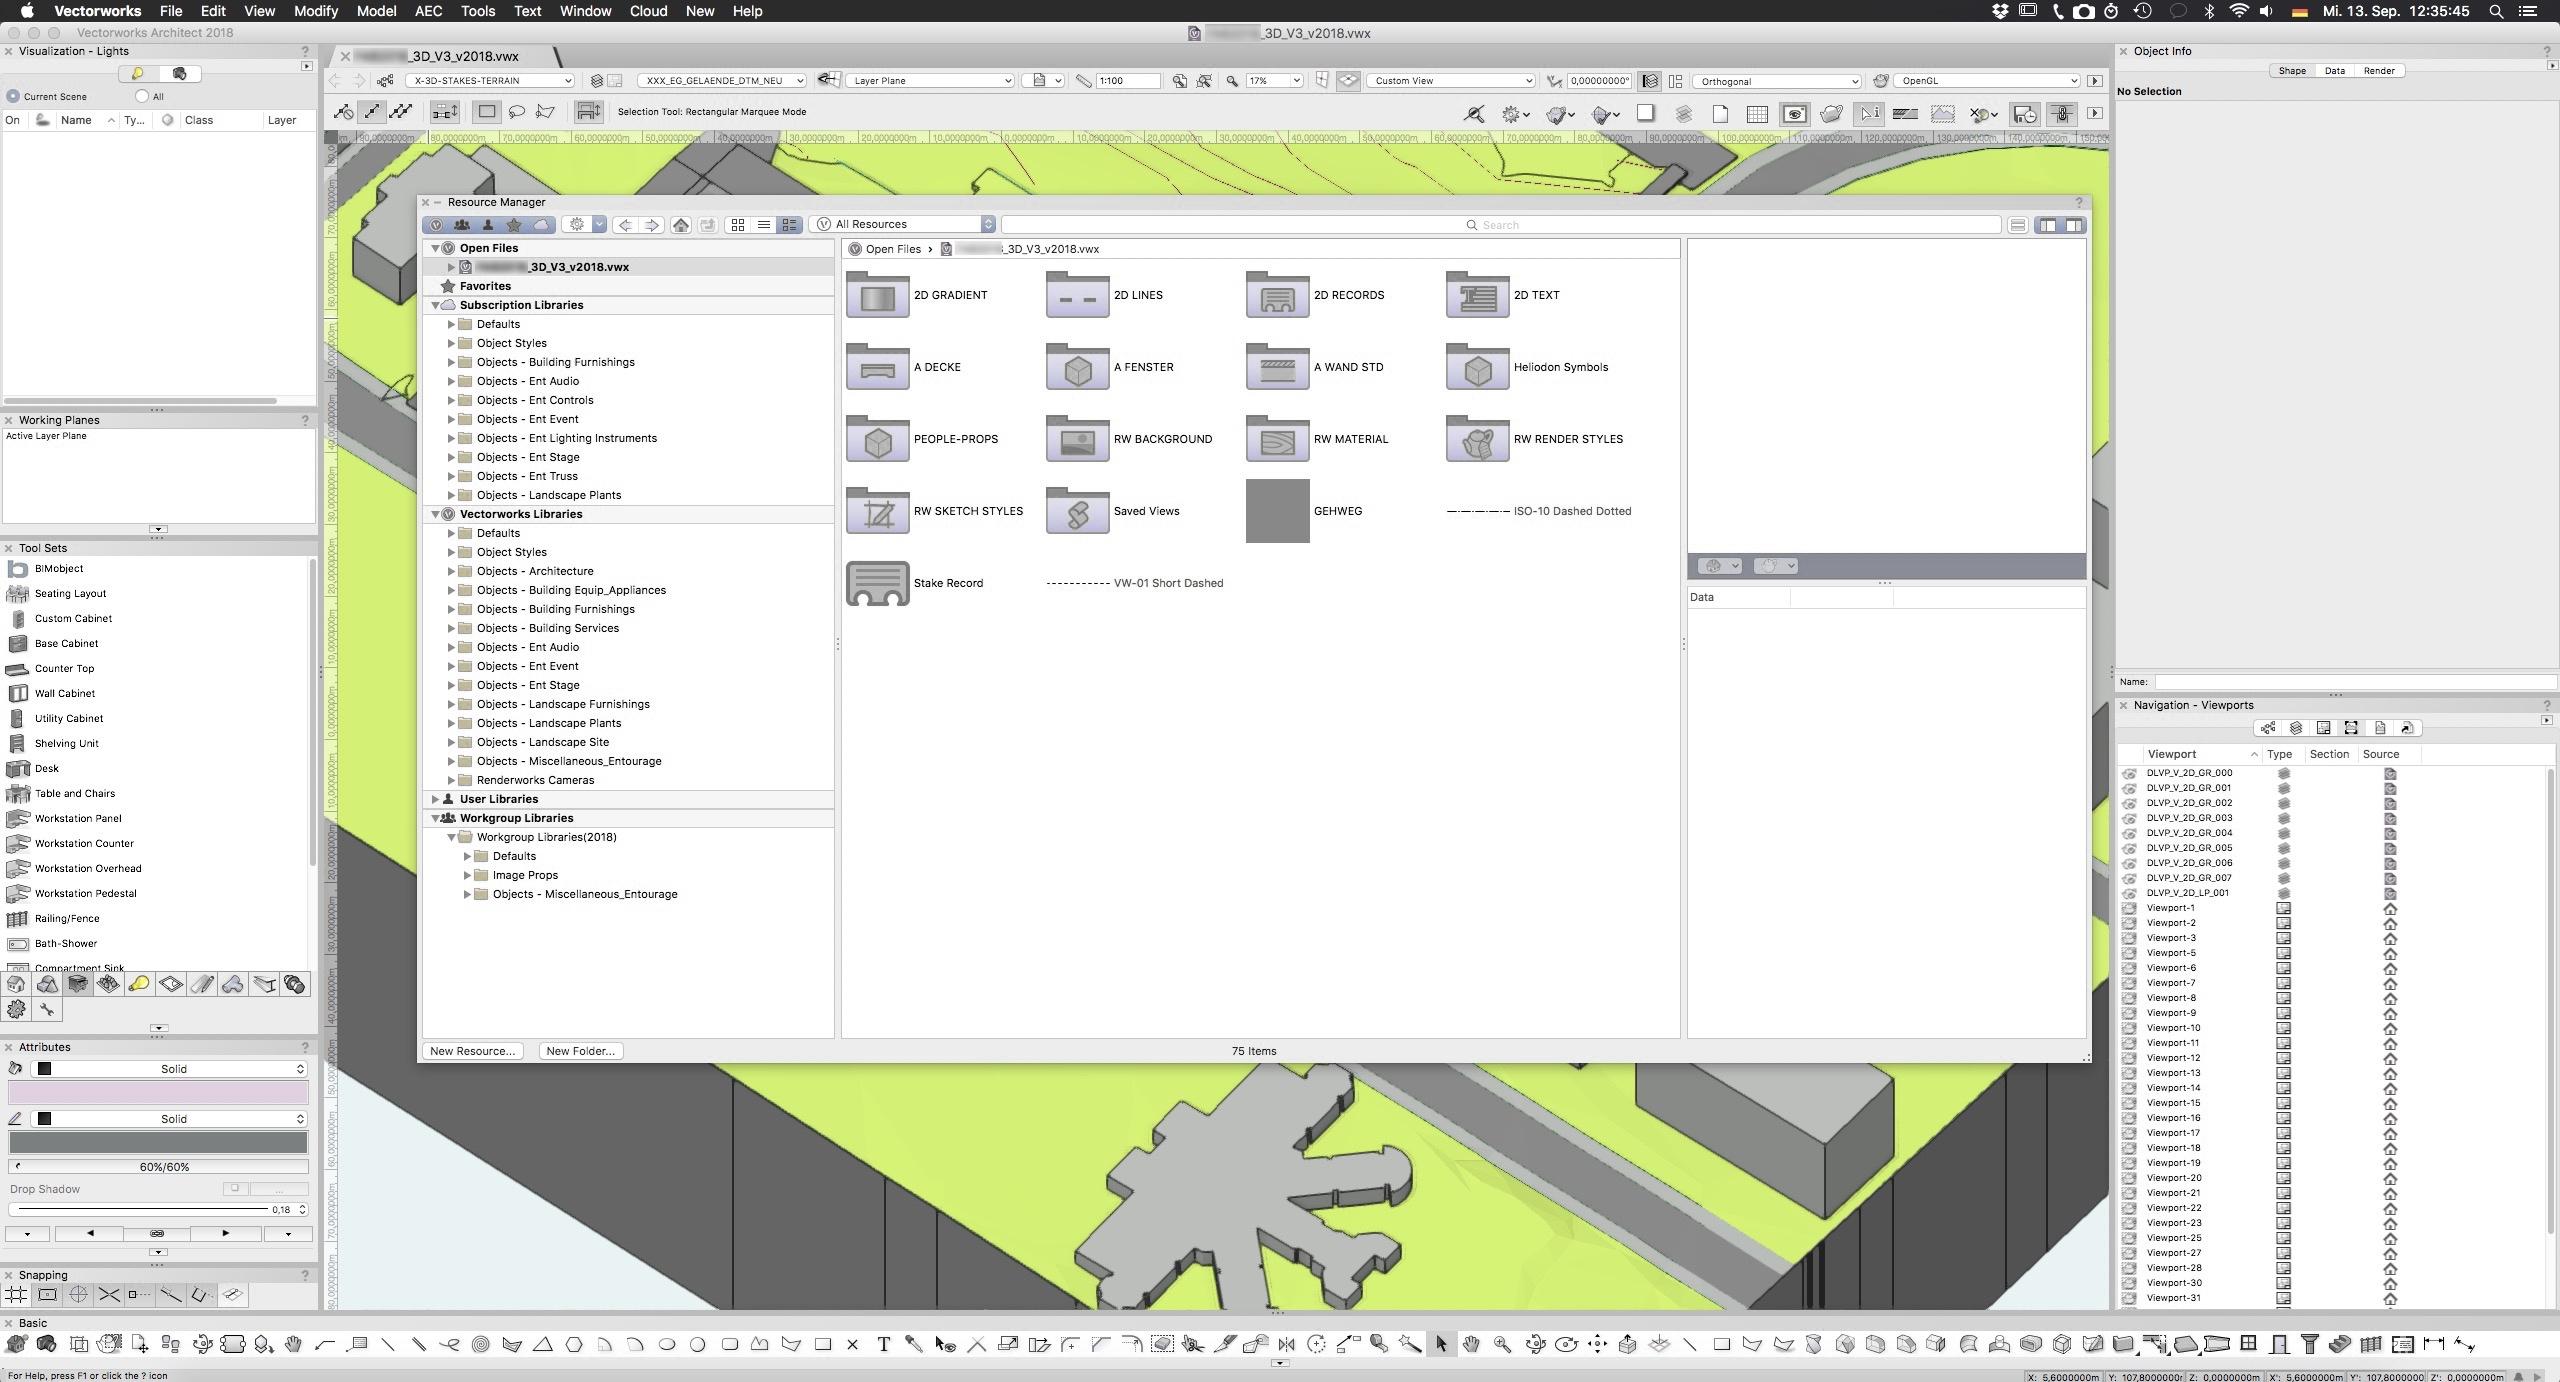 Screenshot-UI.jpg.3eca97e25d9162aaff1c9f6768e4cb4c.jpg